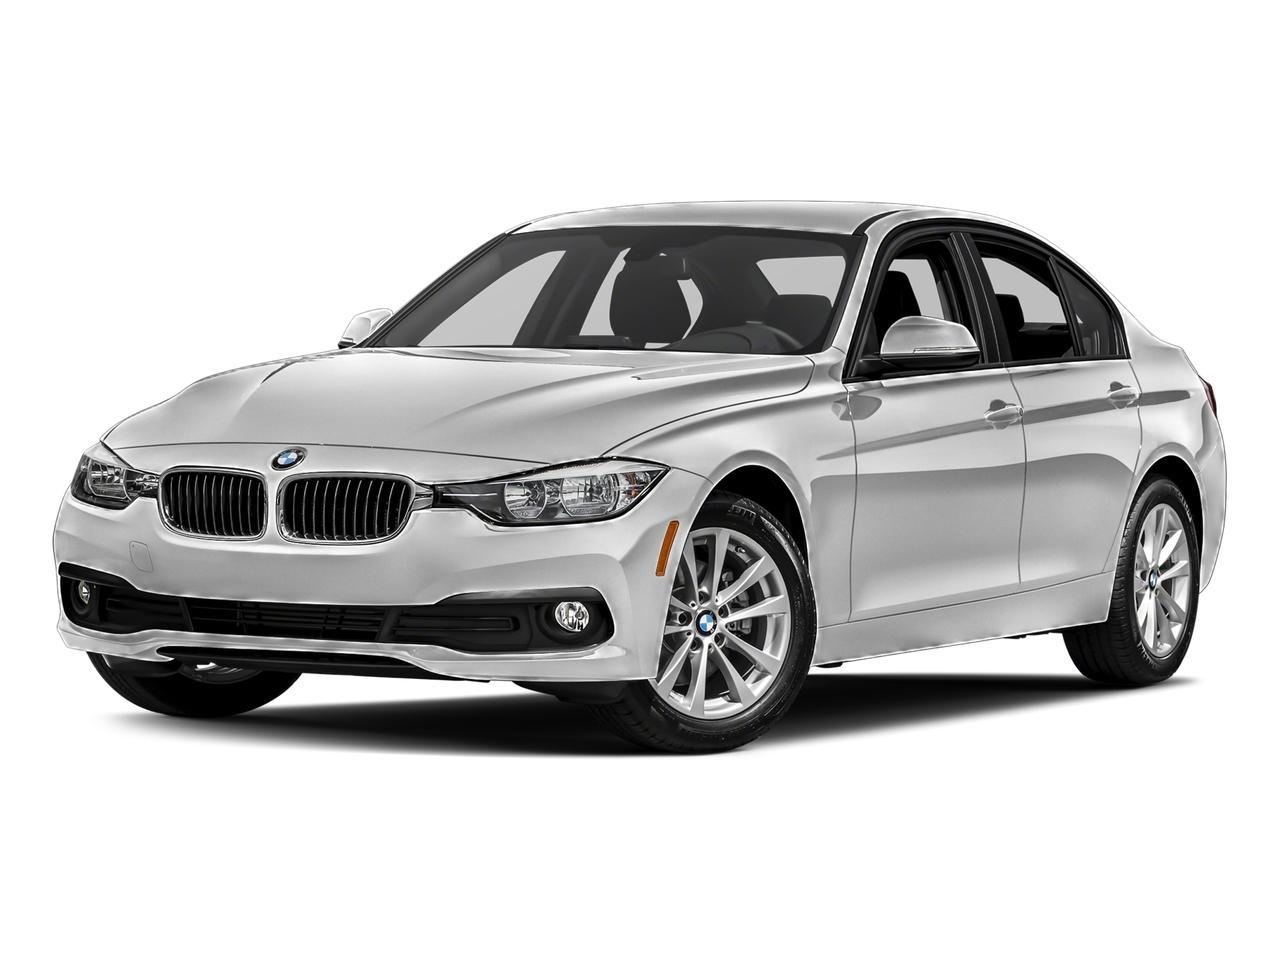 2017 BMW 320i Vehicle Photo in Edinburg, TX 78539